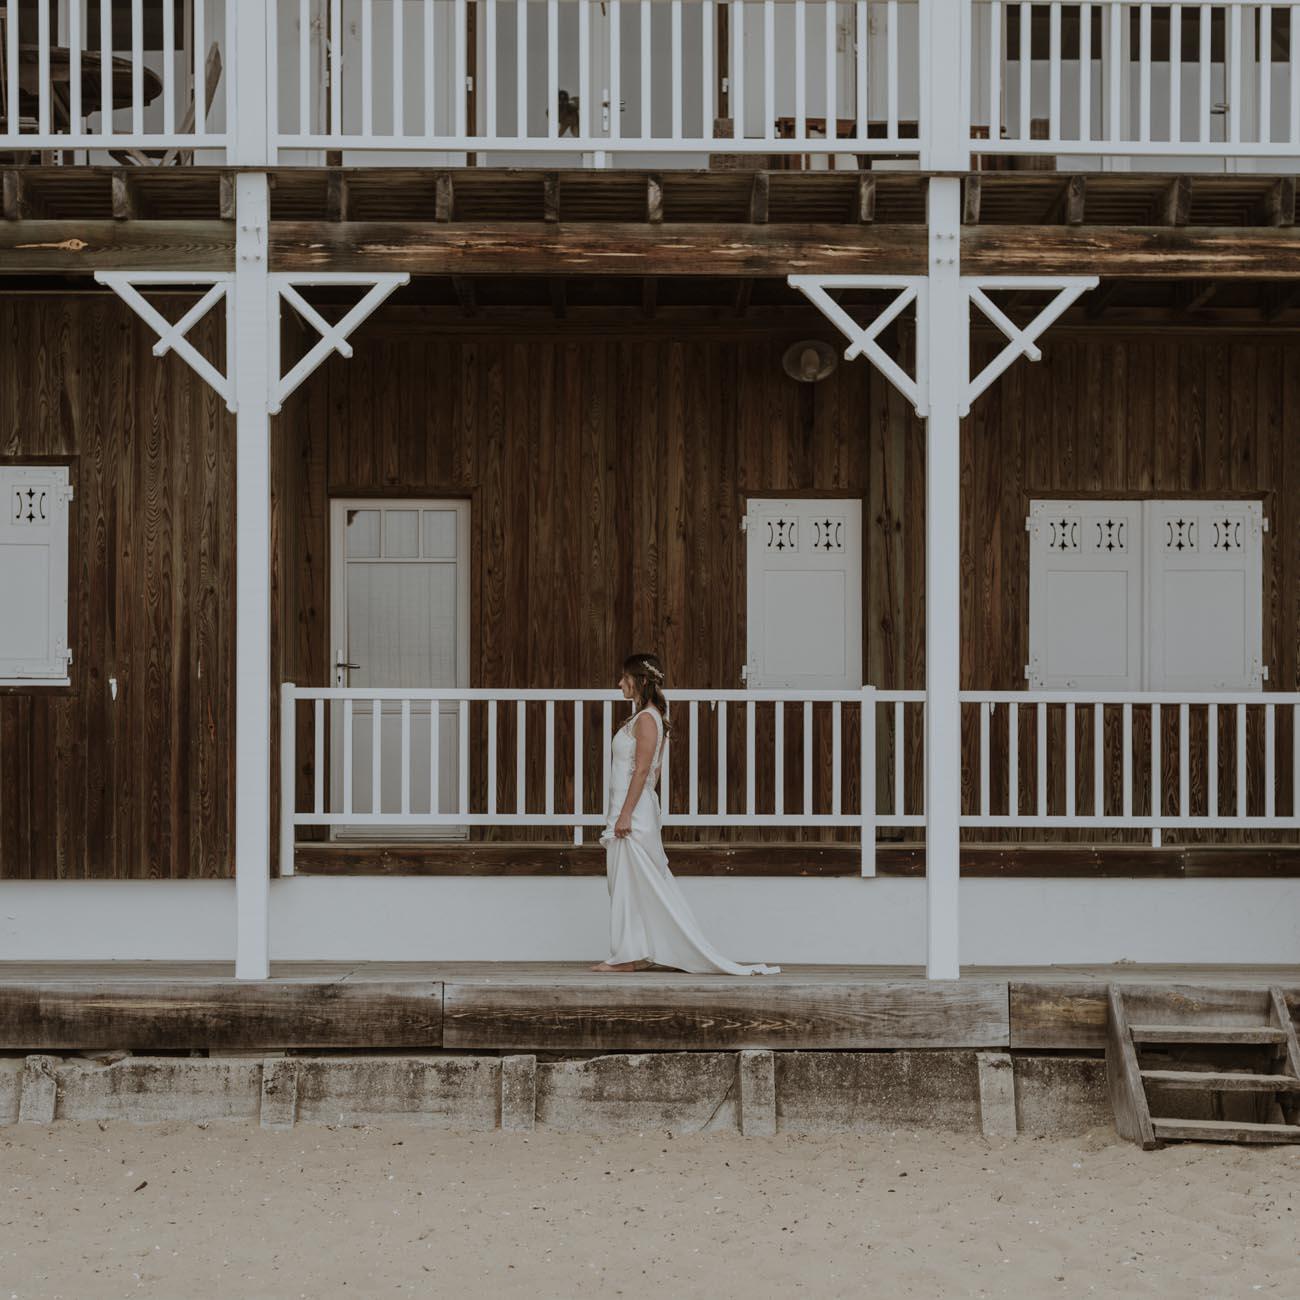 Vinso photographe mariage elodie cap ferret bordeaux gironde-WEB-59.jpg